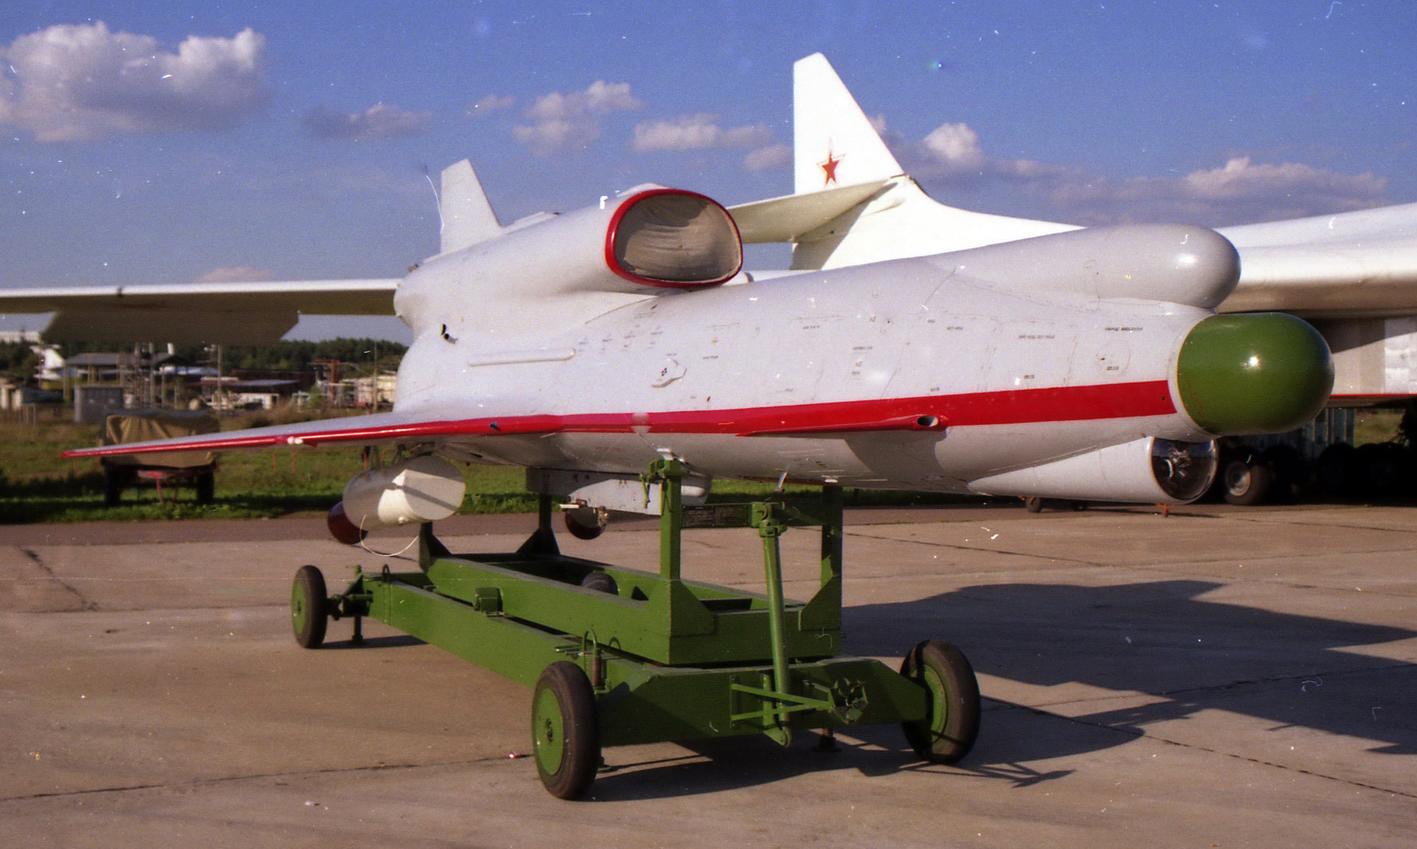 https://modernweapon.ru/images/specialaircraft/TU-300_3.jpg